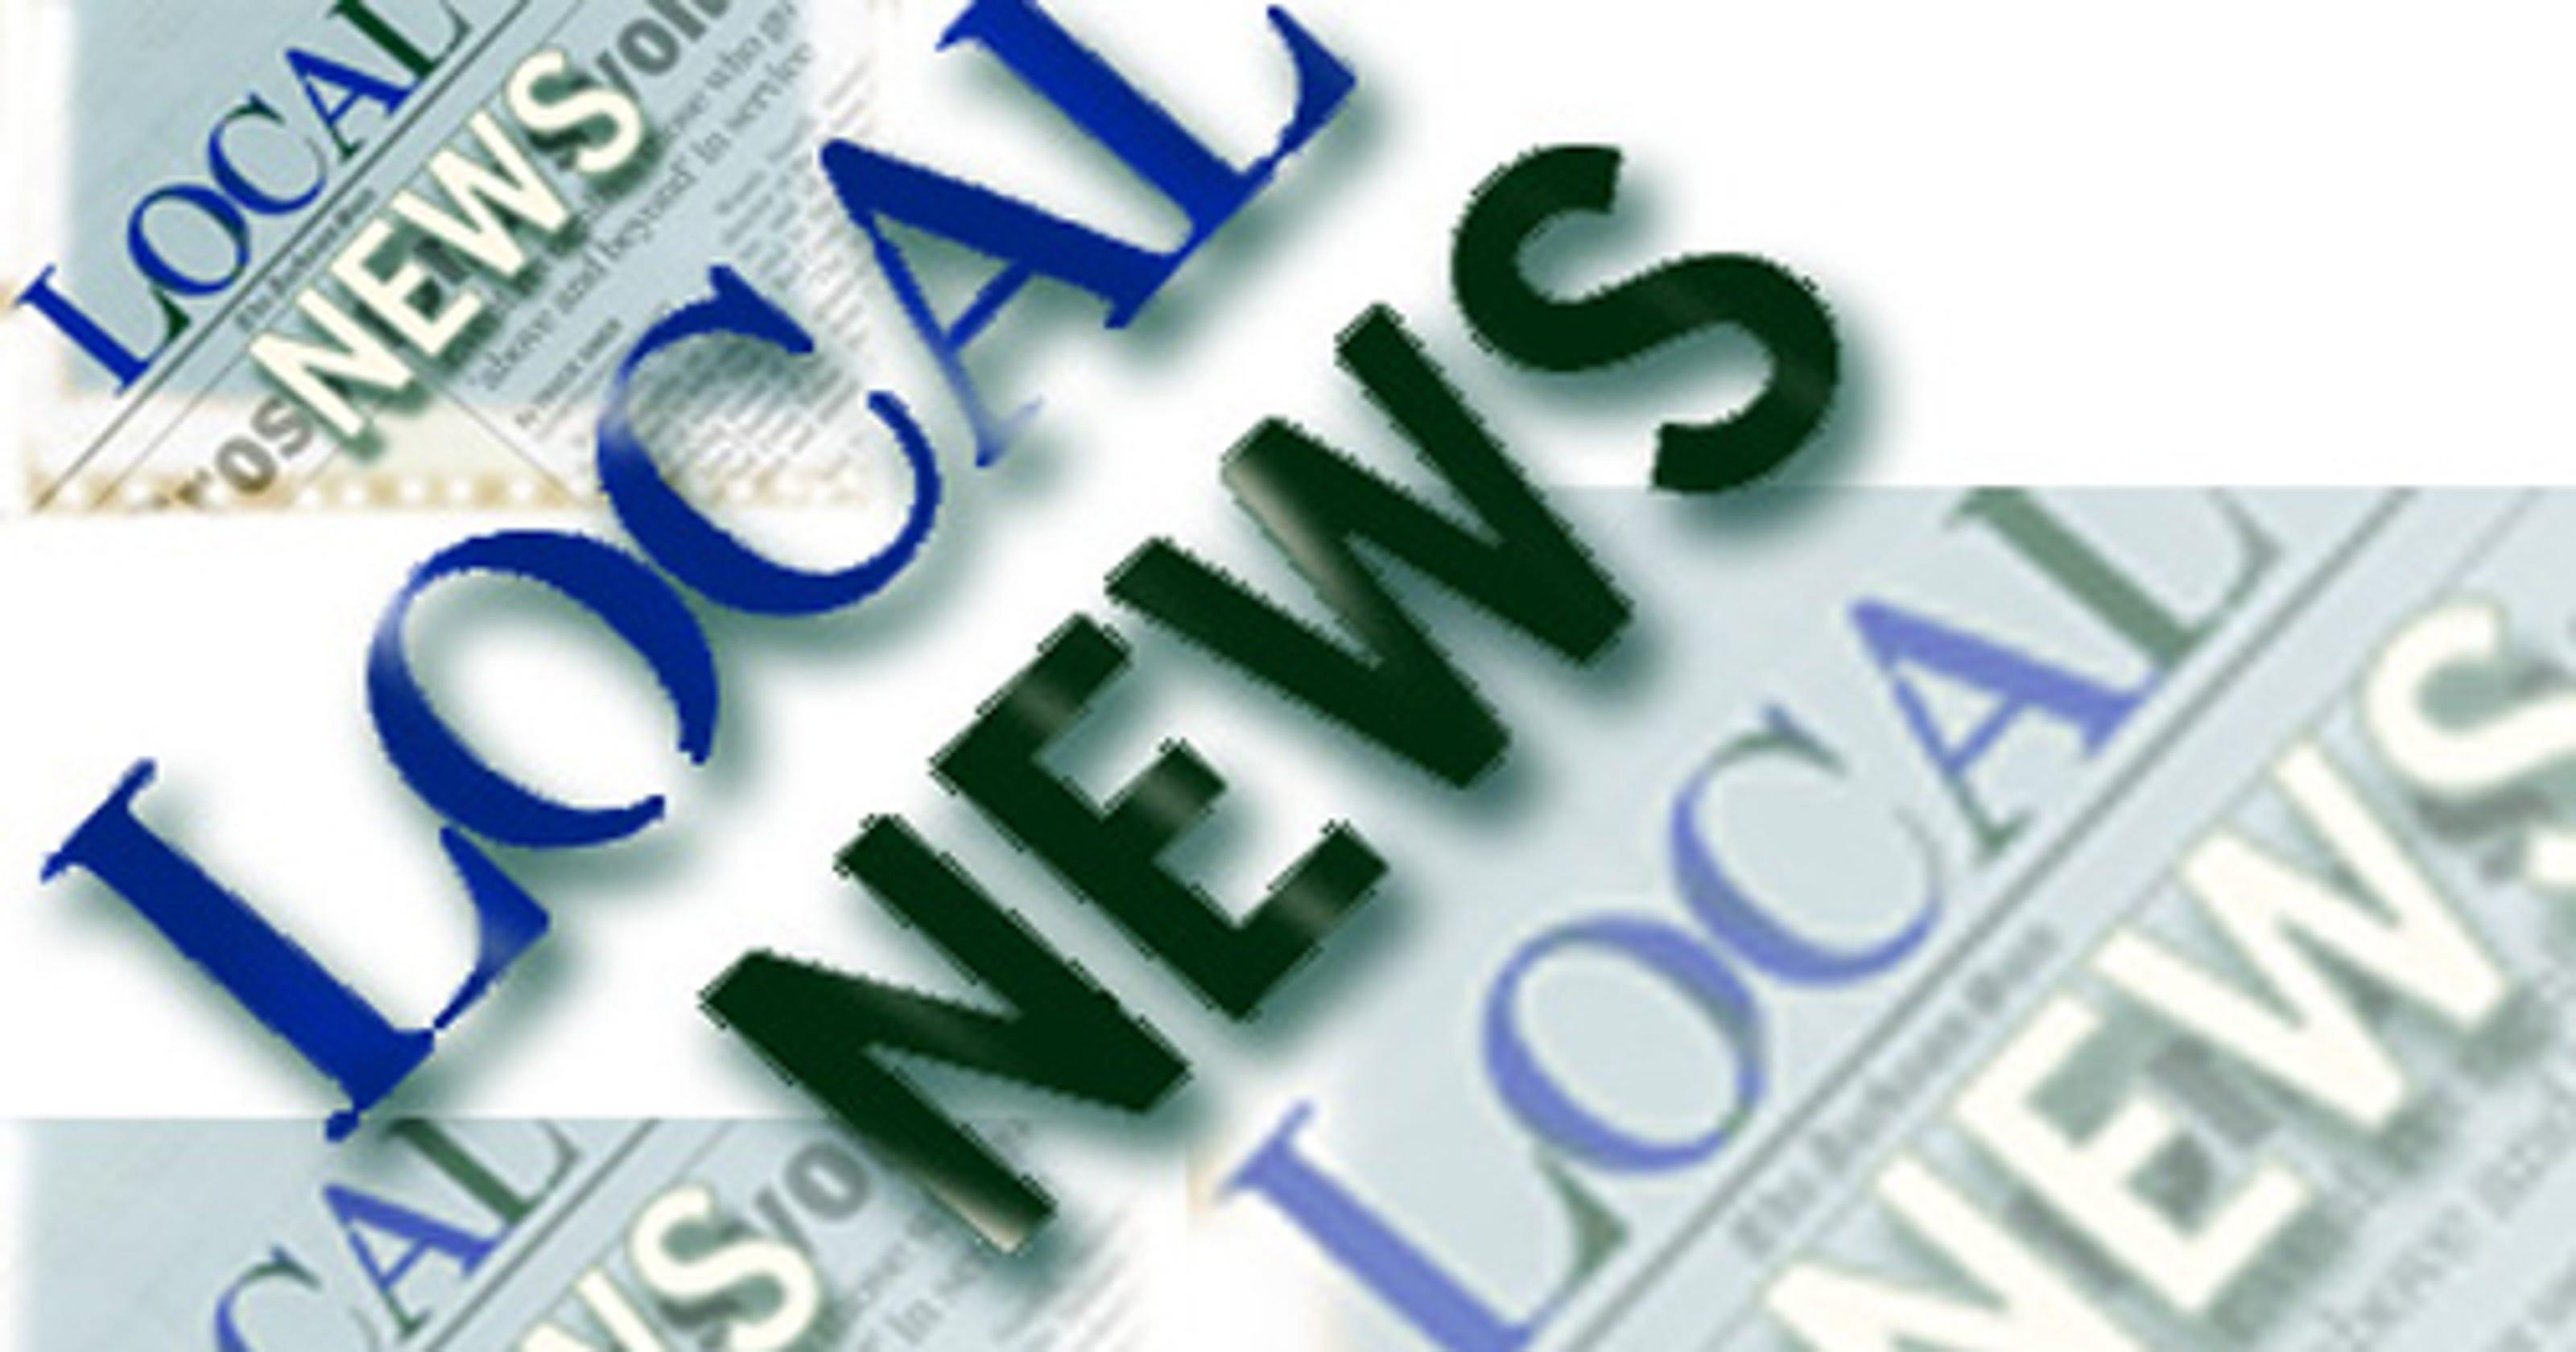 Investigation to focus on Brownsville/Haywood dispatch